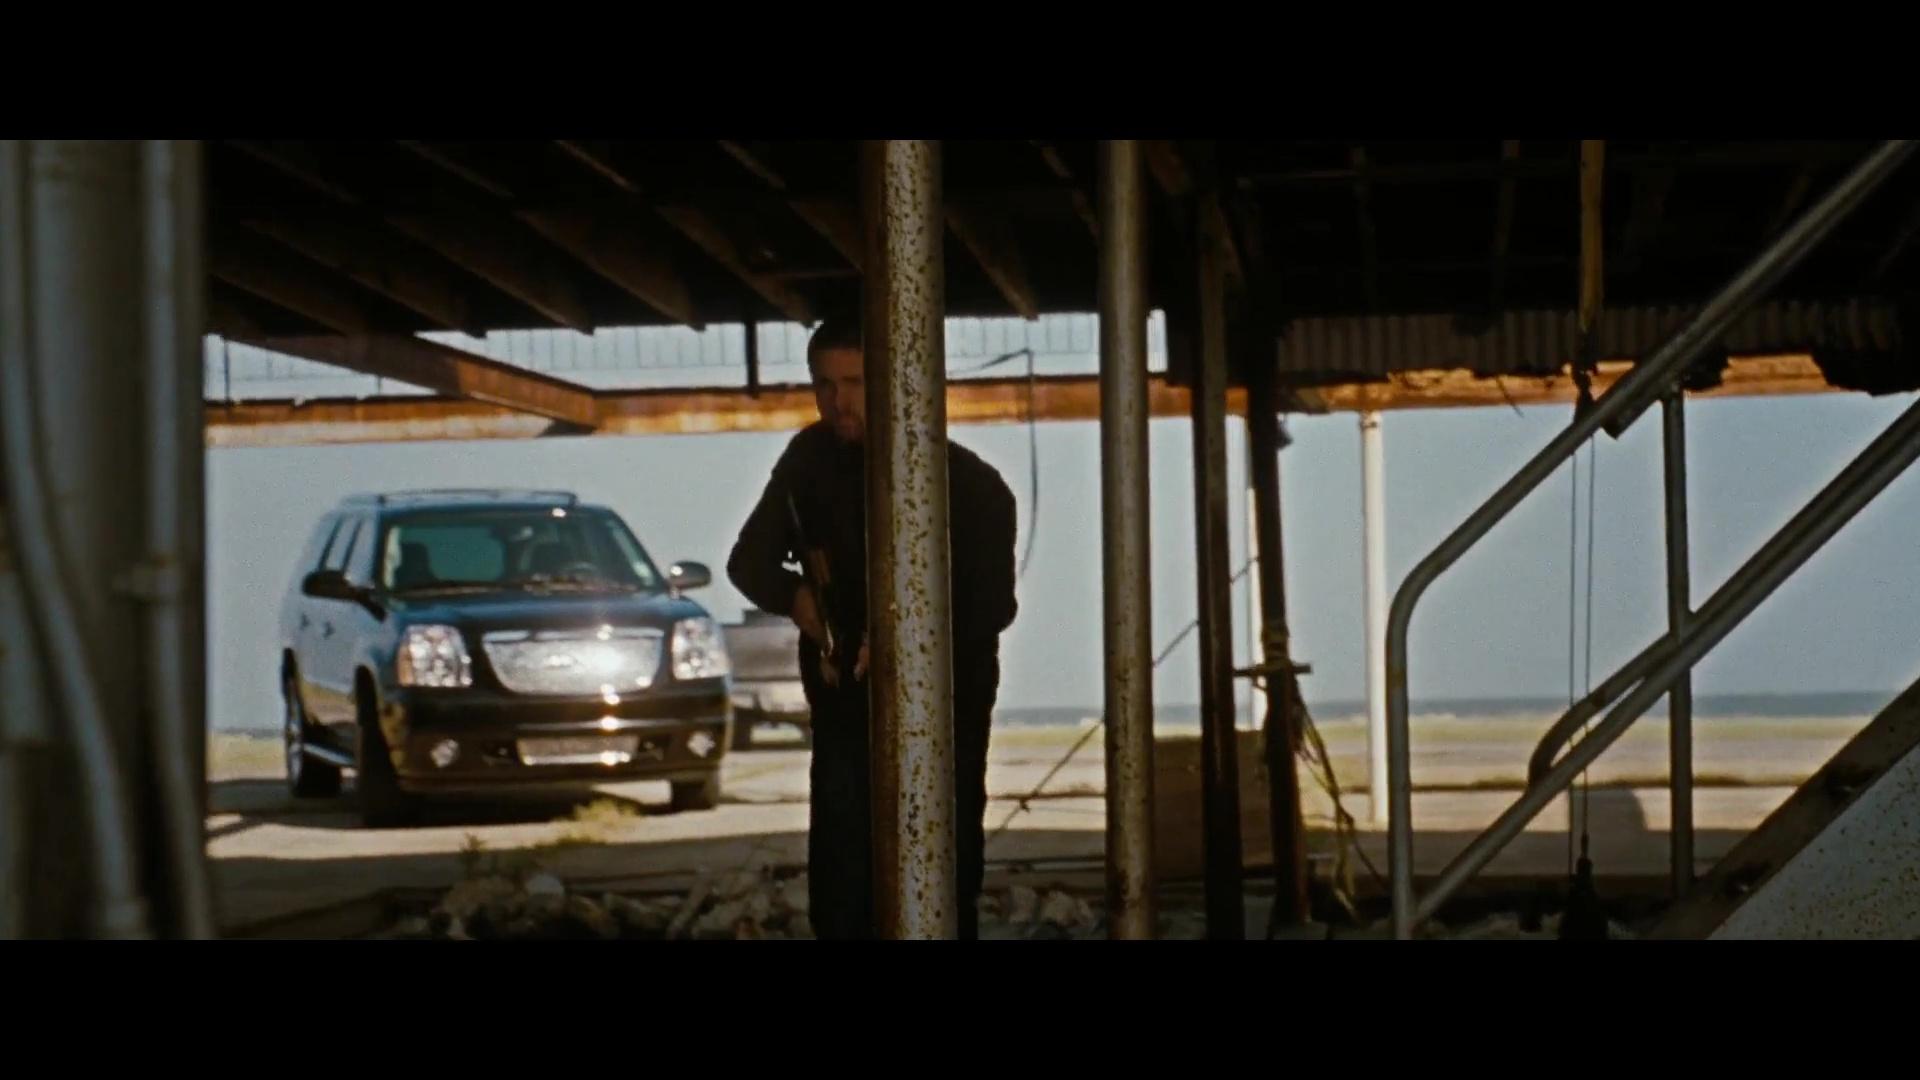 El Especialista 1080p Lat-Cast-Ing 5.1 (2011)